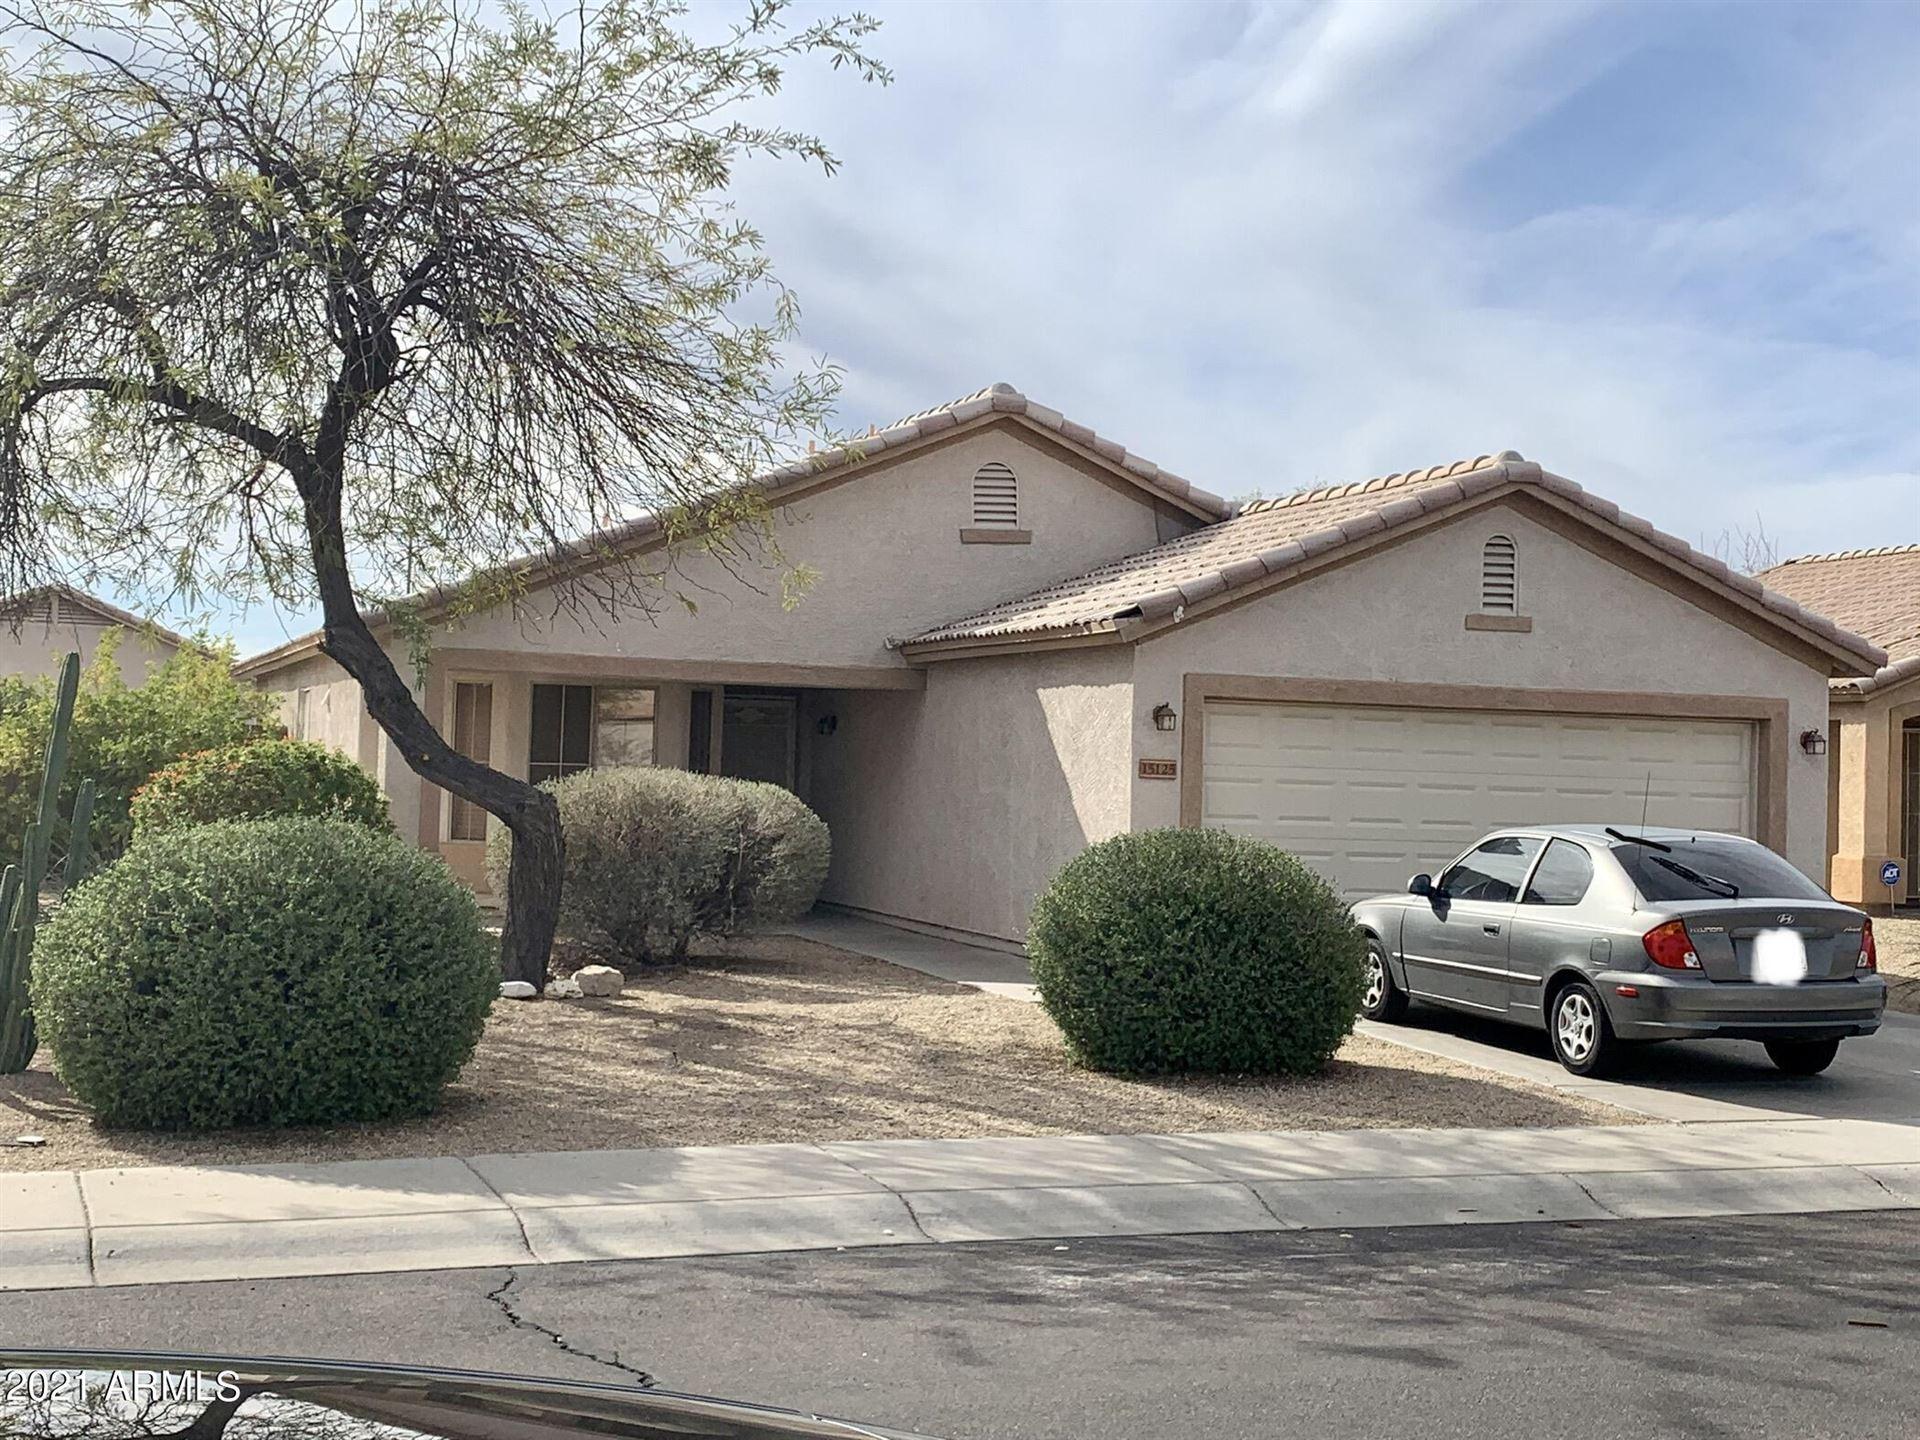 Photo of 15125 W ELKO Drive, Surprise, AZ 85374 (MLS # 6197478)